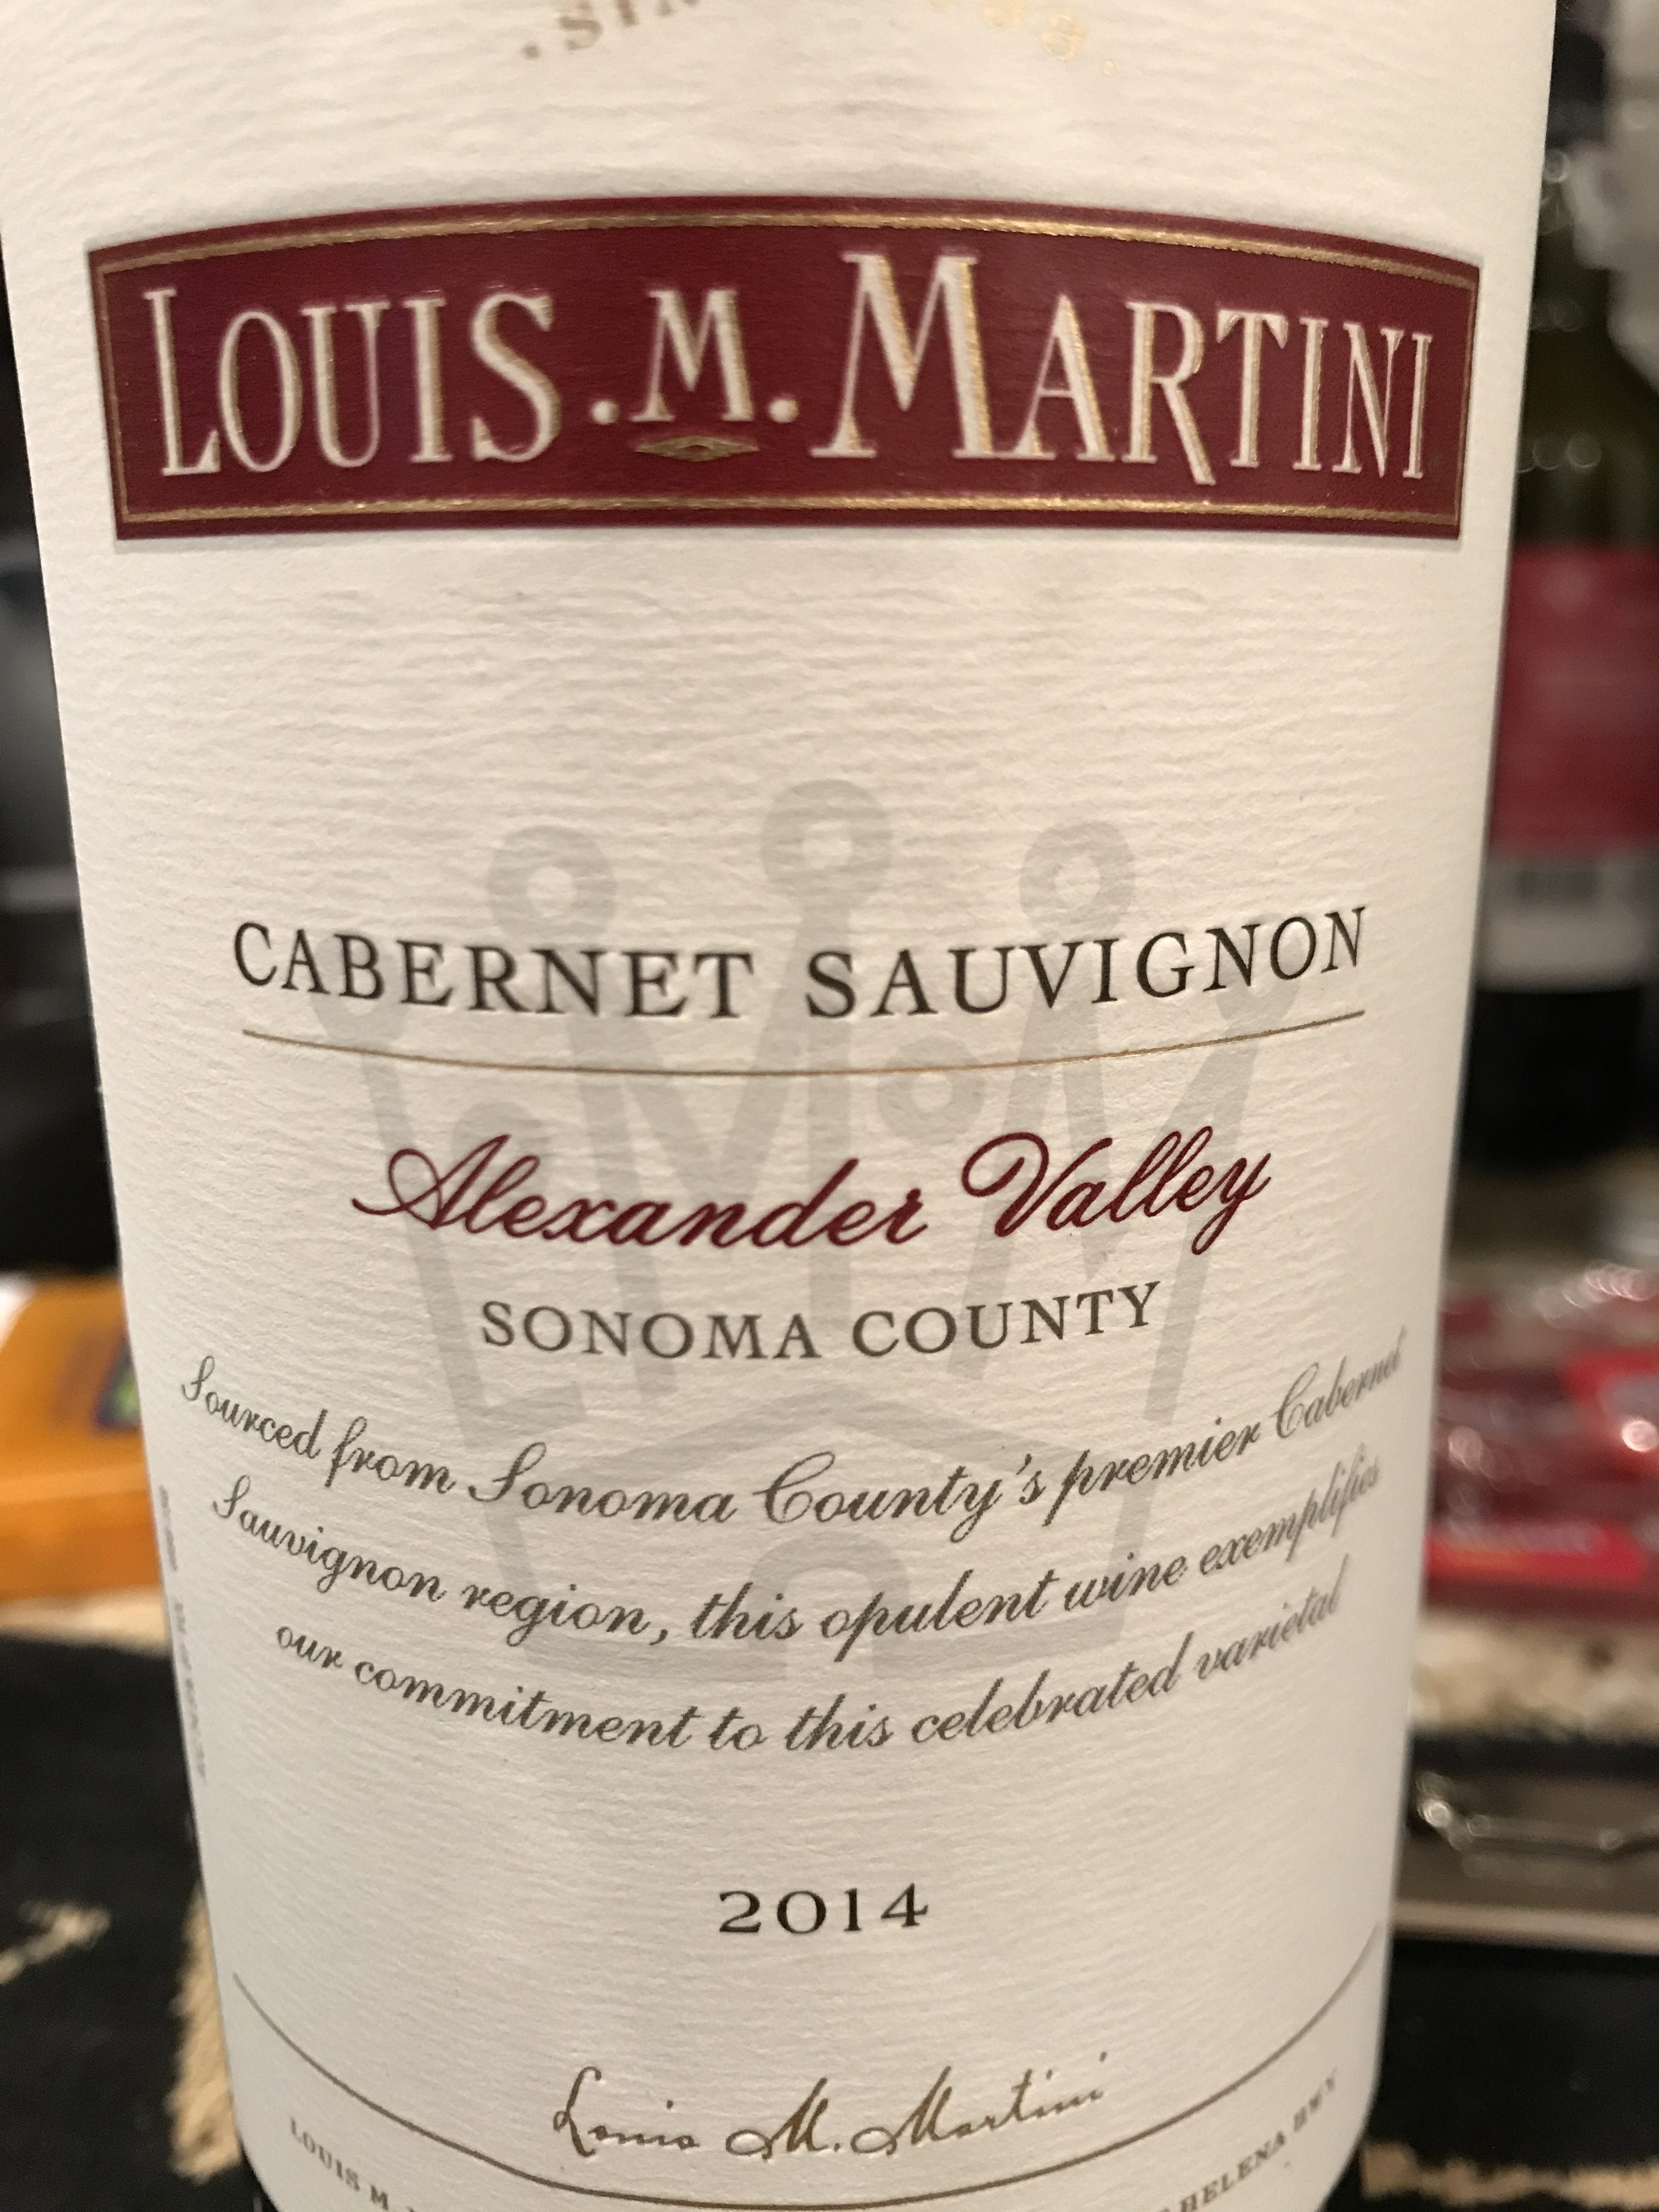 Louis M. Martini Cabernet Sauvignon Alexander Valley 2014